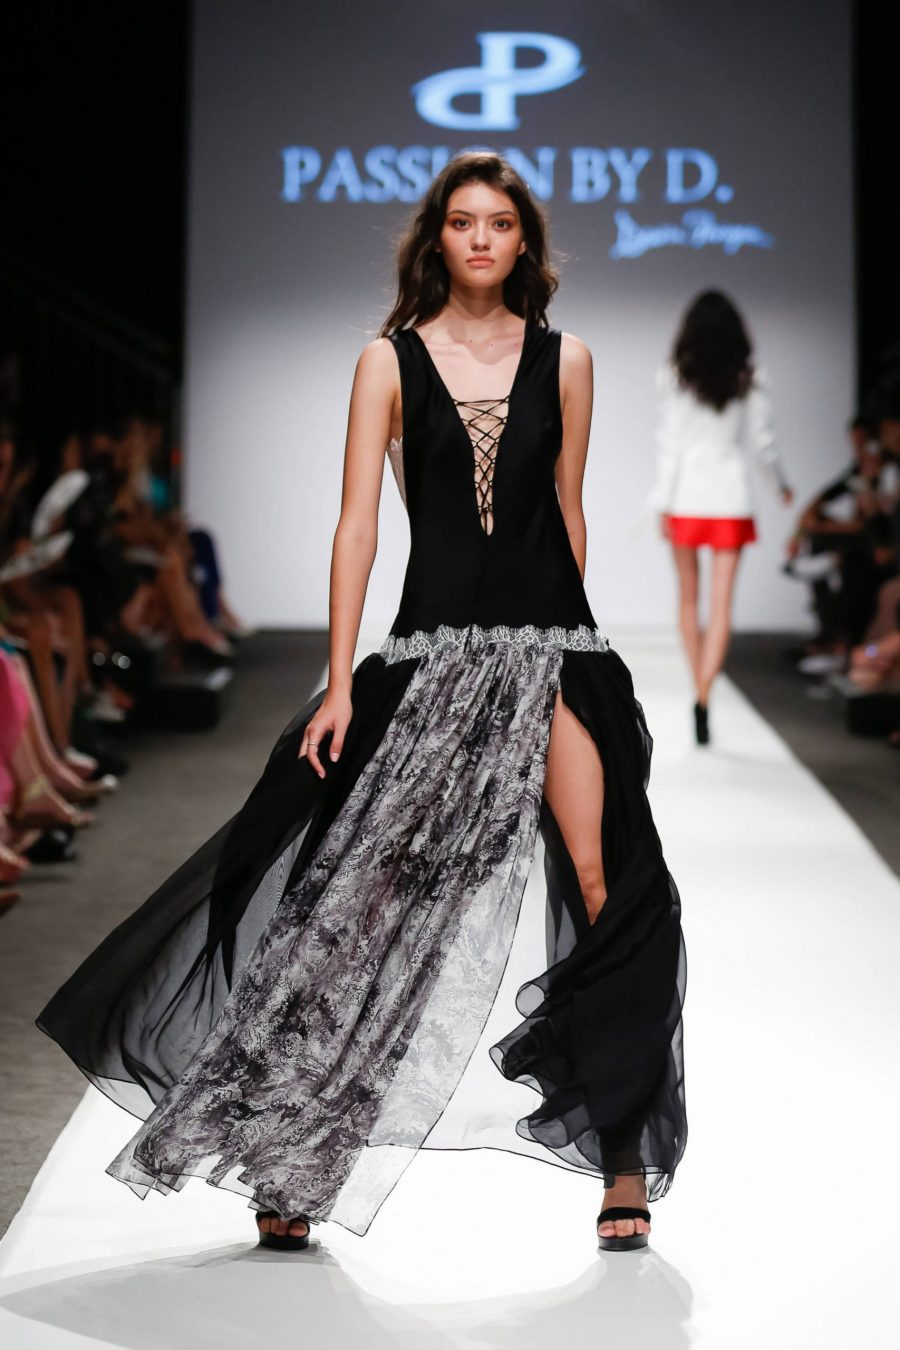 Fashion Show Vienna Fashion week 2019 - Passion by D